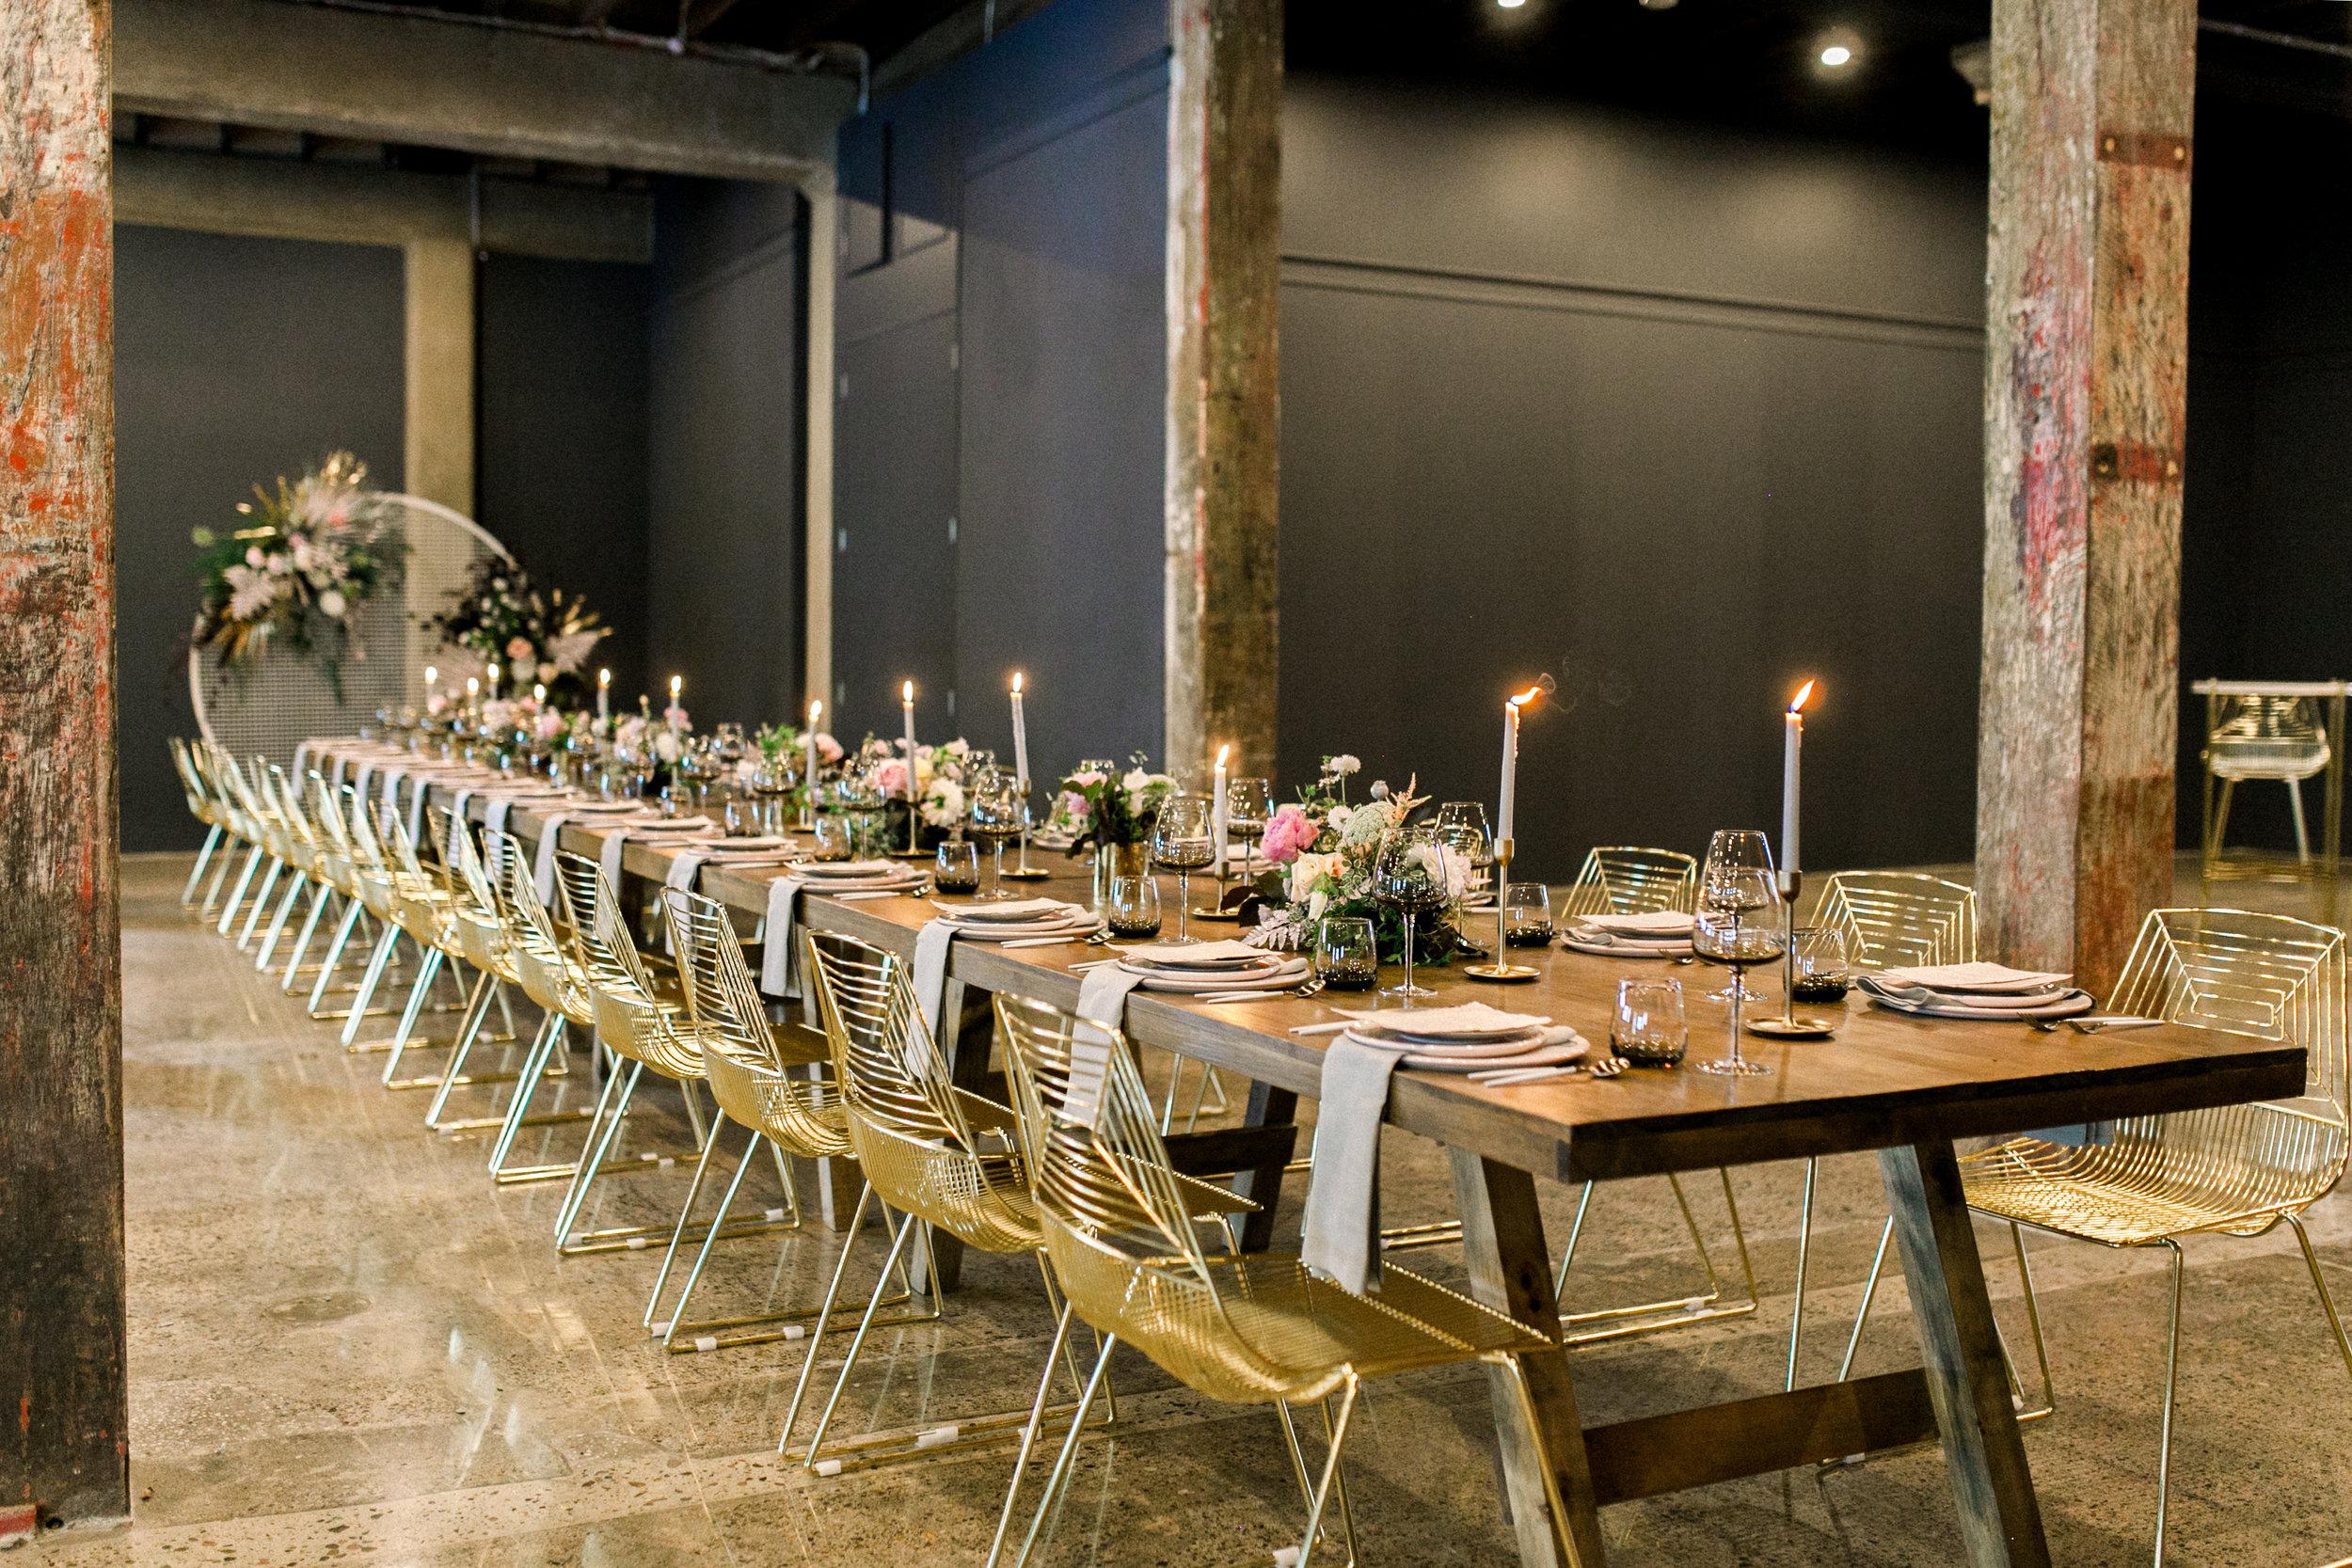 New Brisbane wedding event venue hire2.jpg